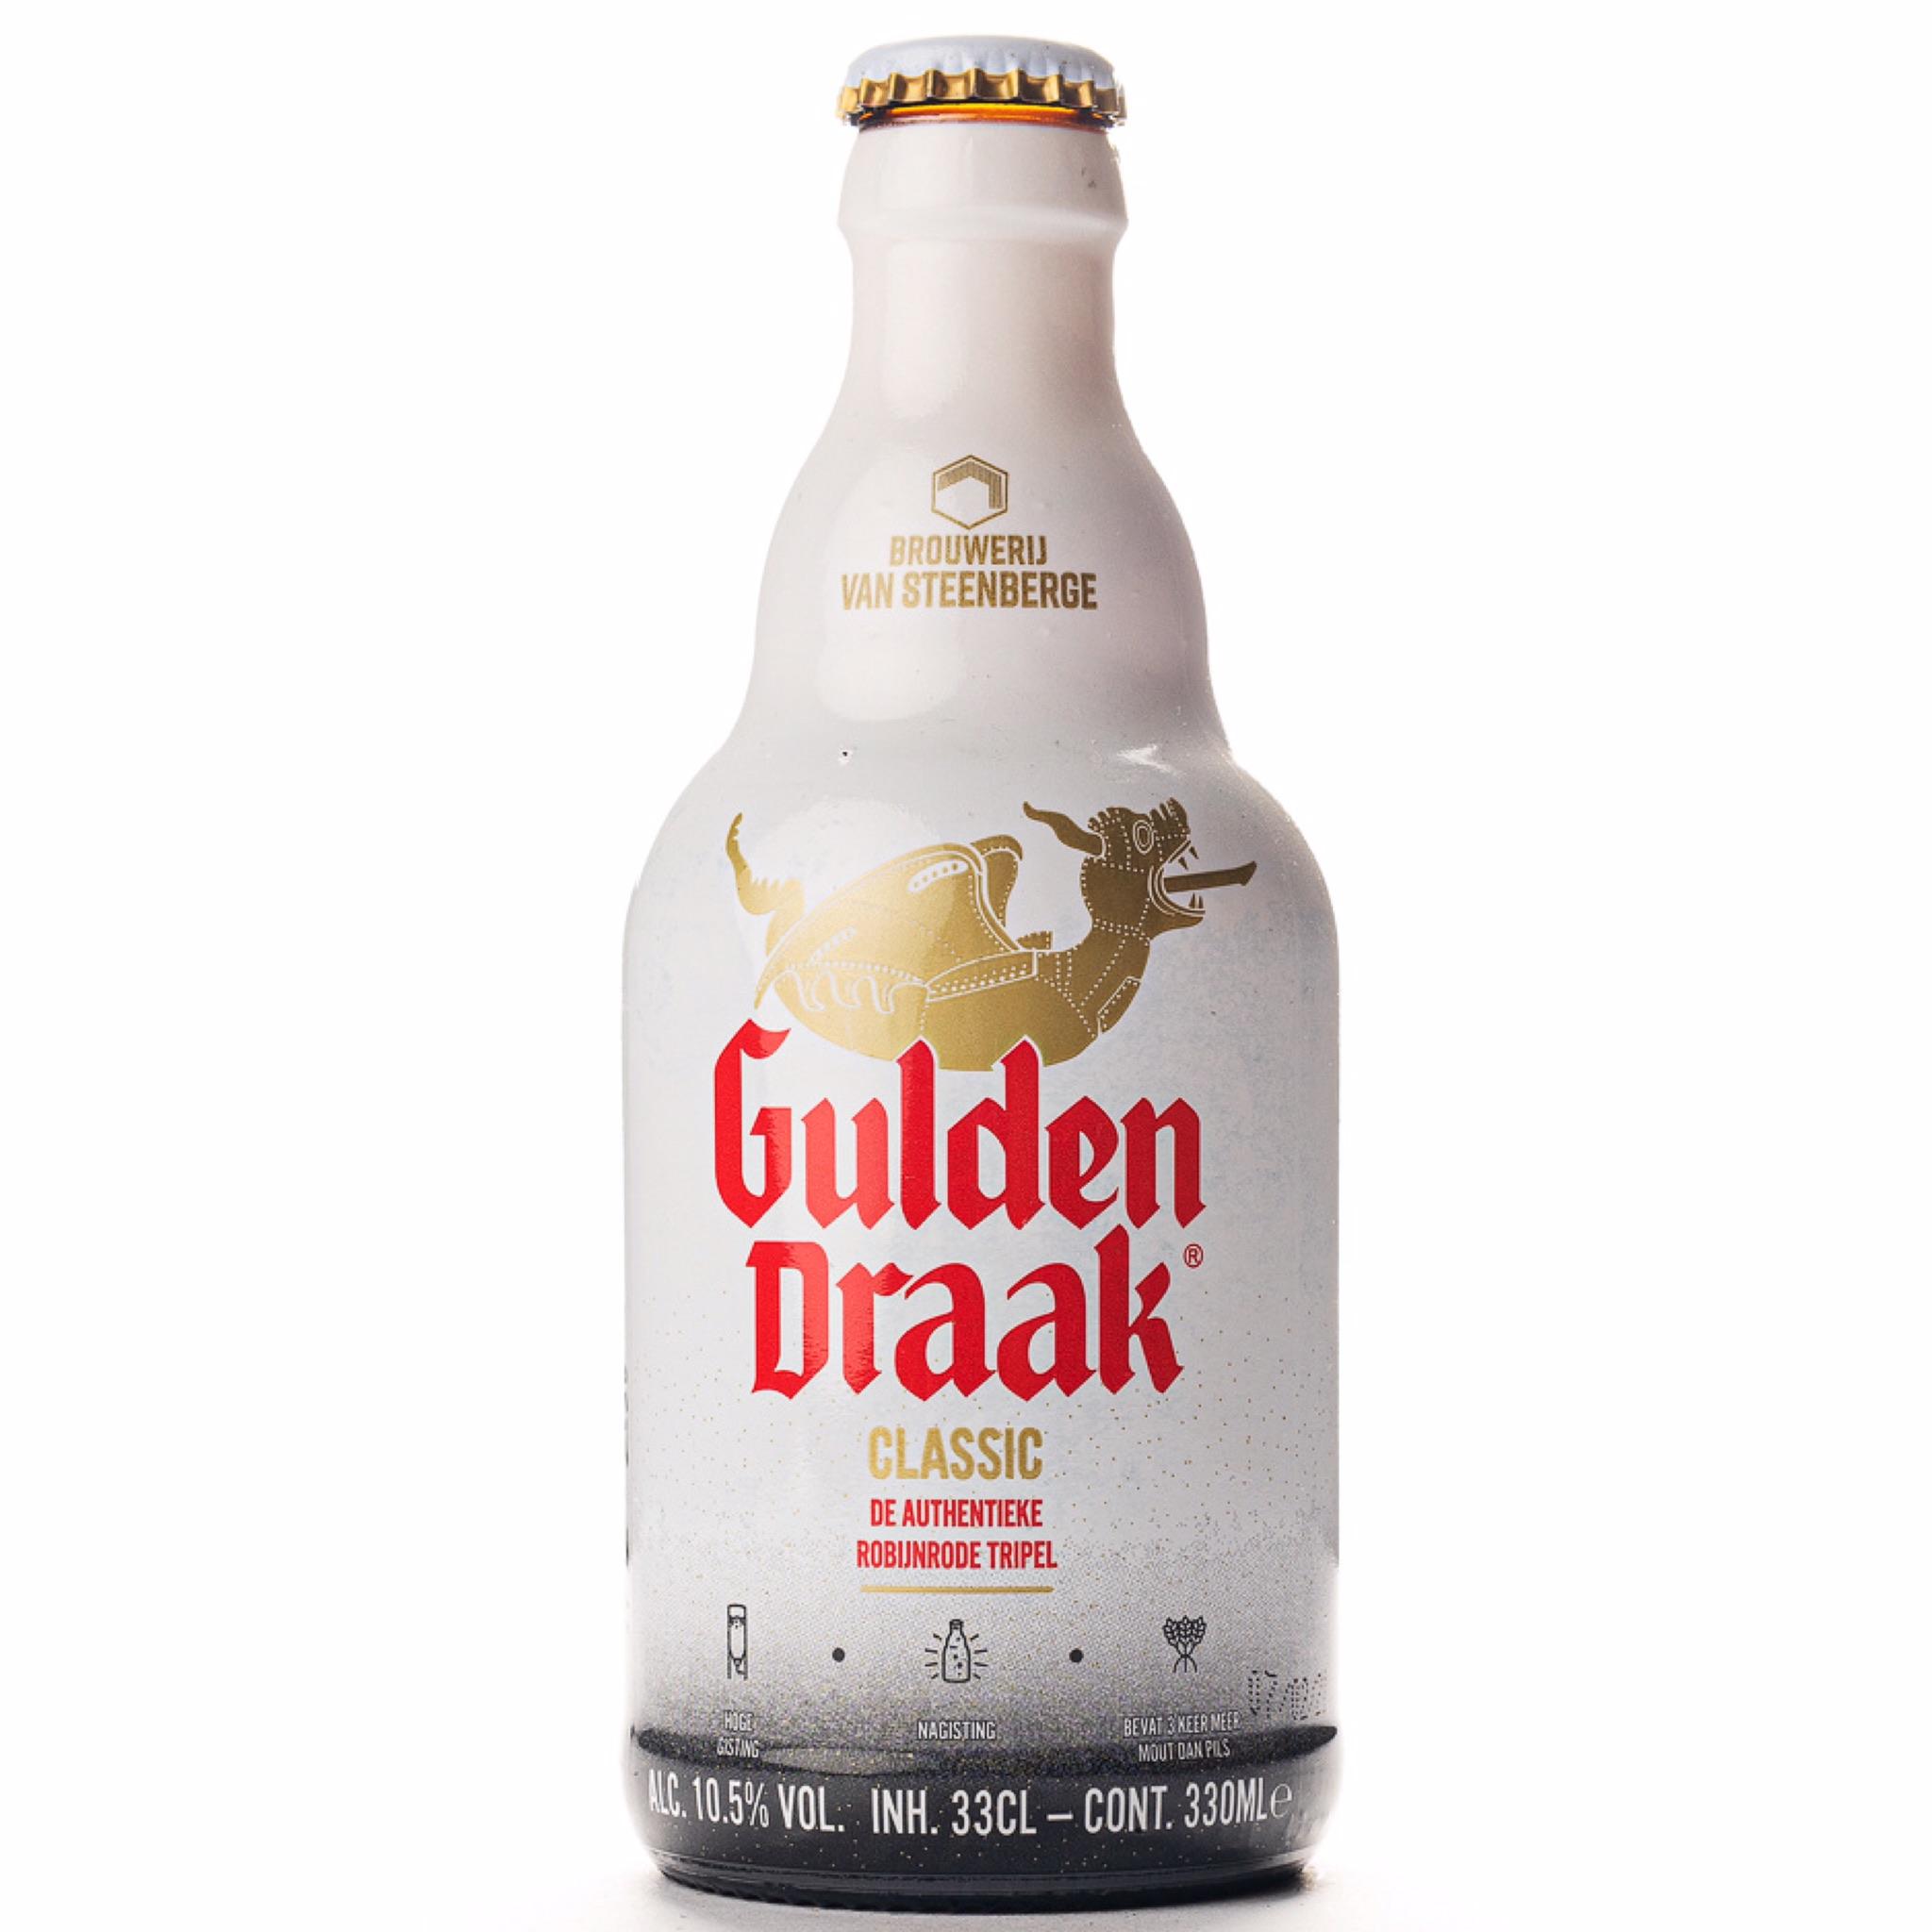 Gulden Draak 10.5% 330ml Dark & Quadruple